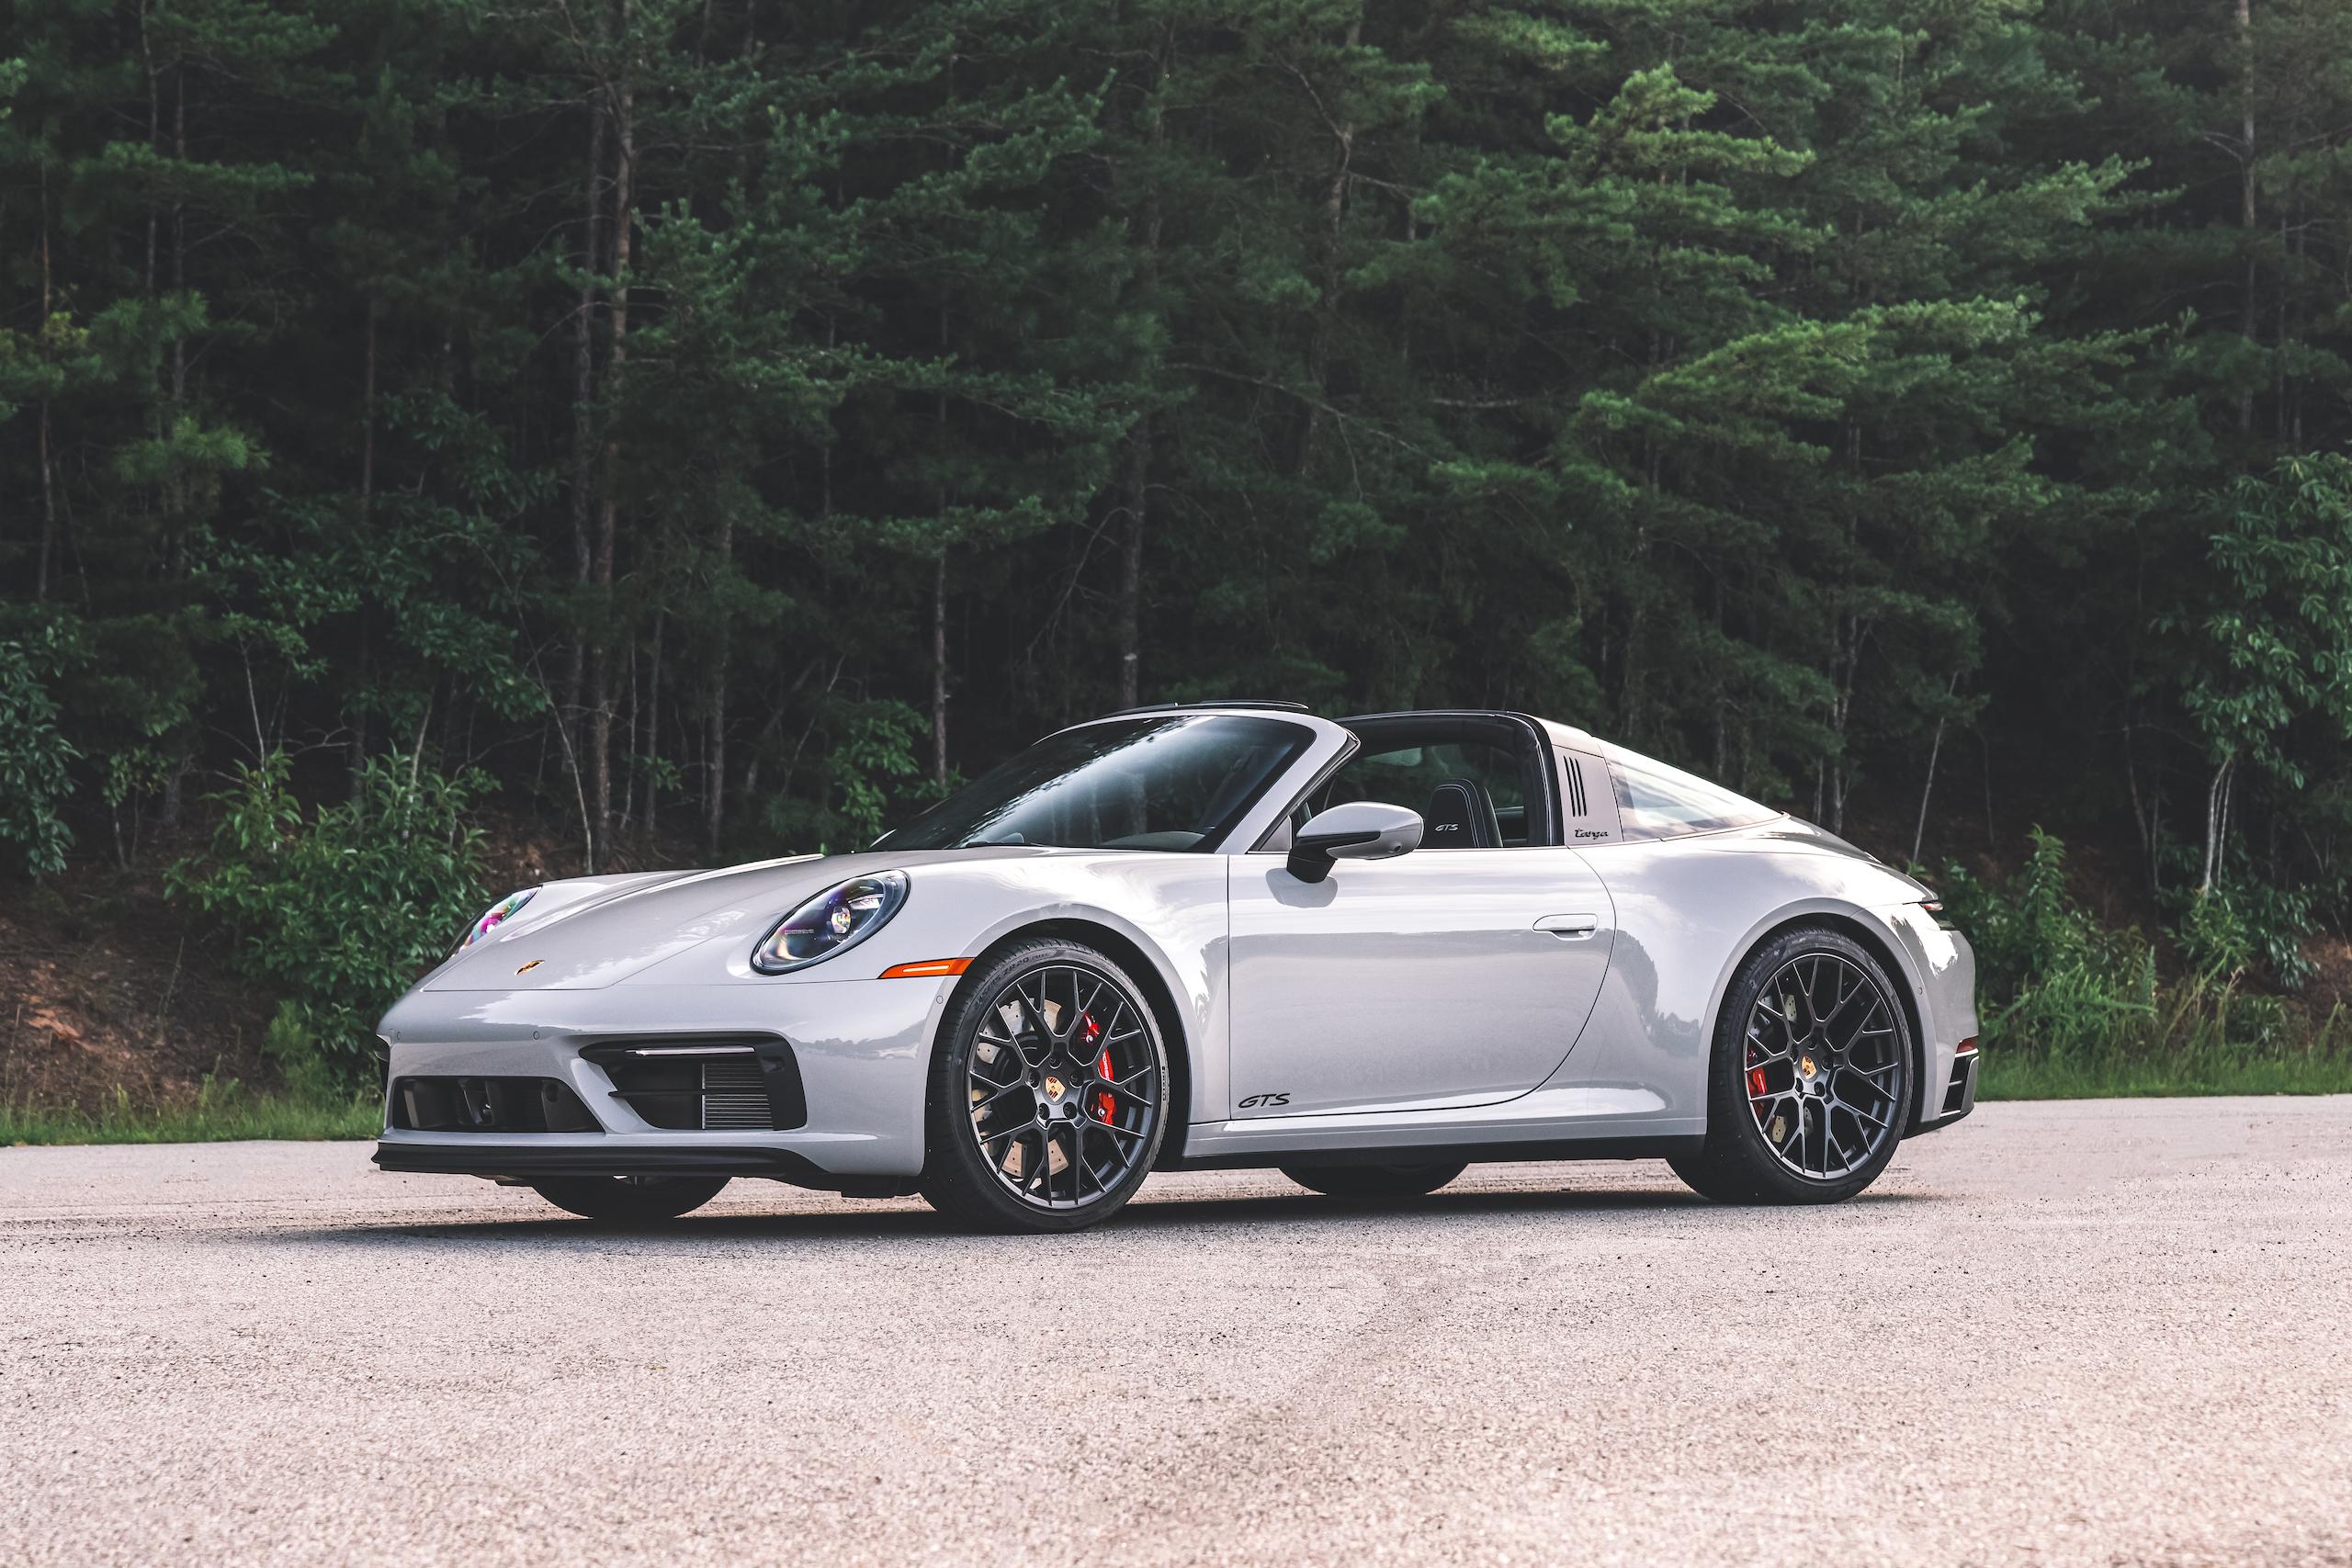 Porsche 911 Targa 4 GTS front three-quarter